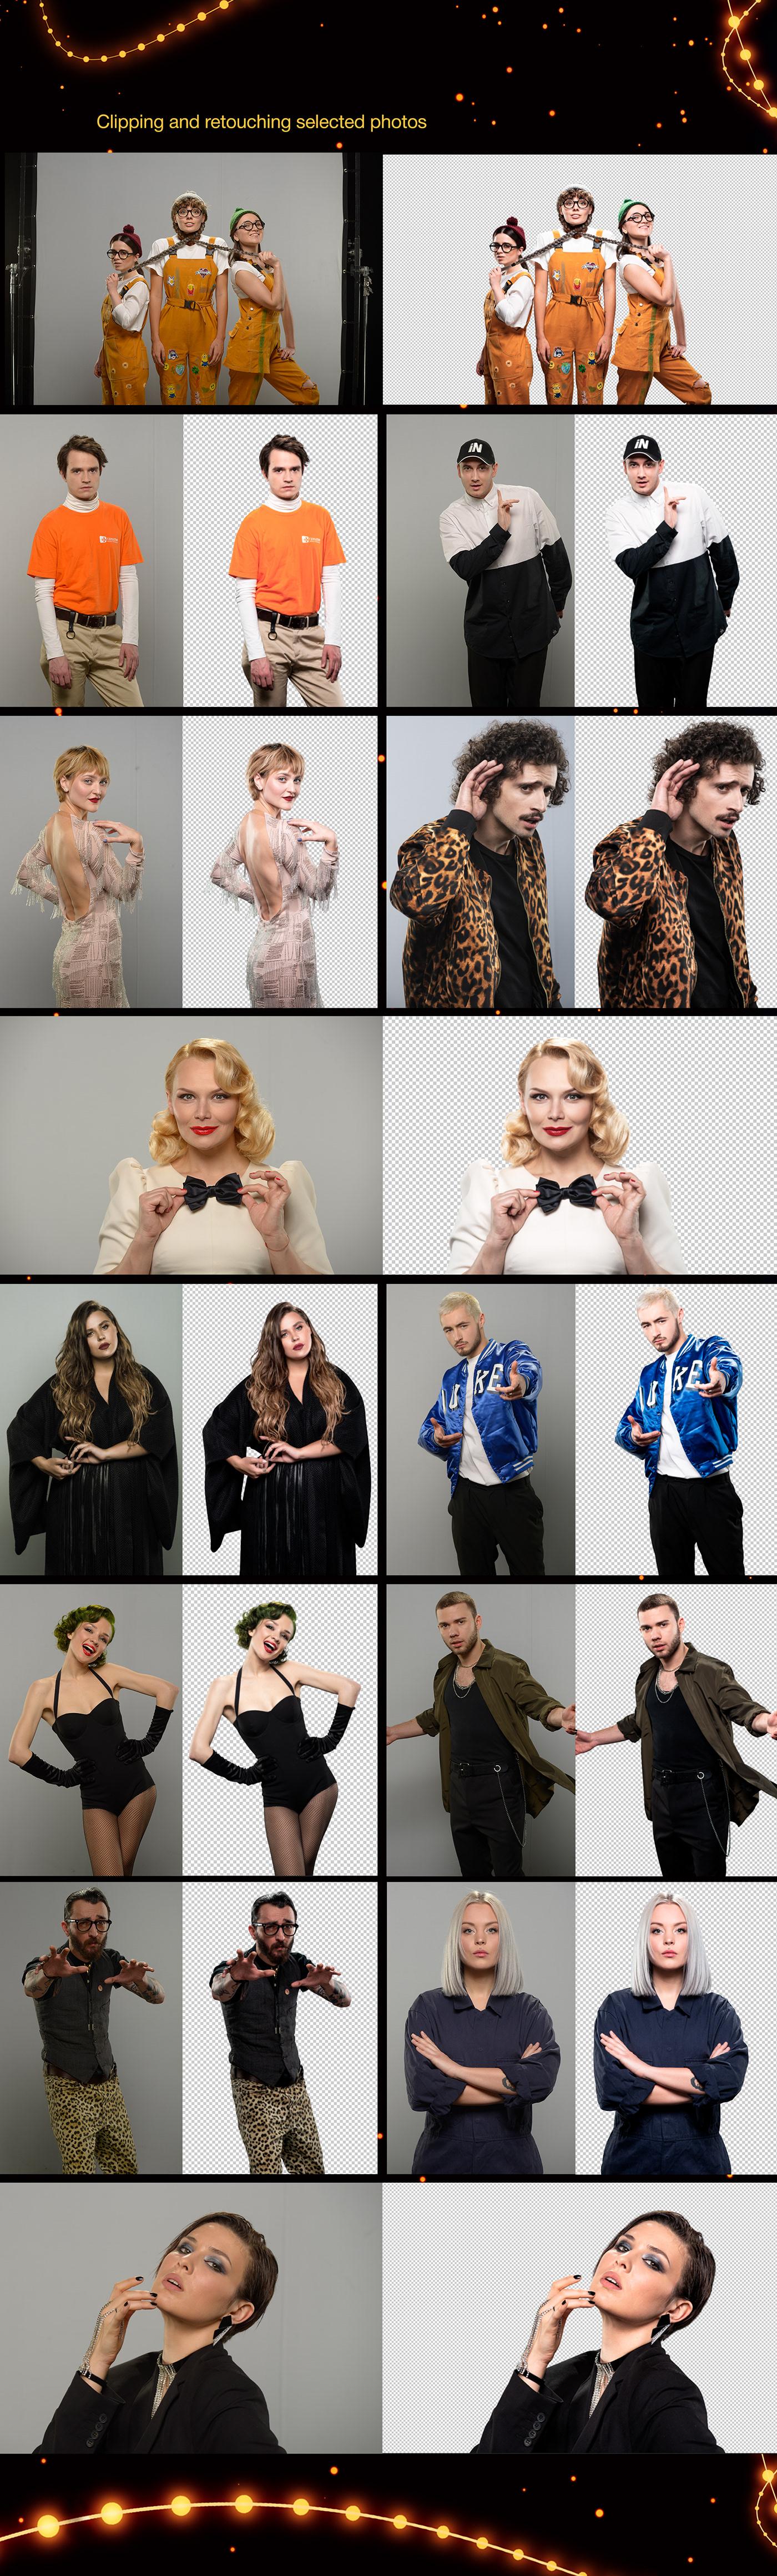 eurovision national selection Ukrane maruv LAUD kazka songs artists profile